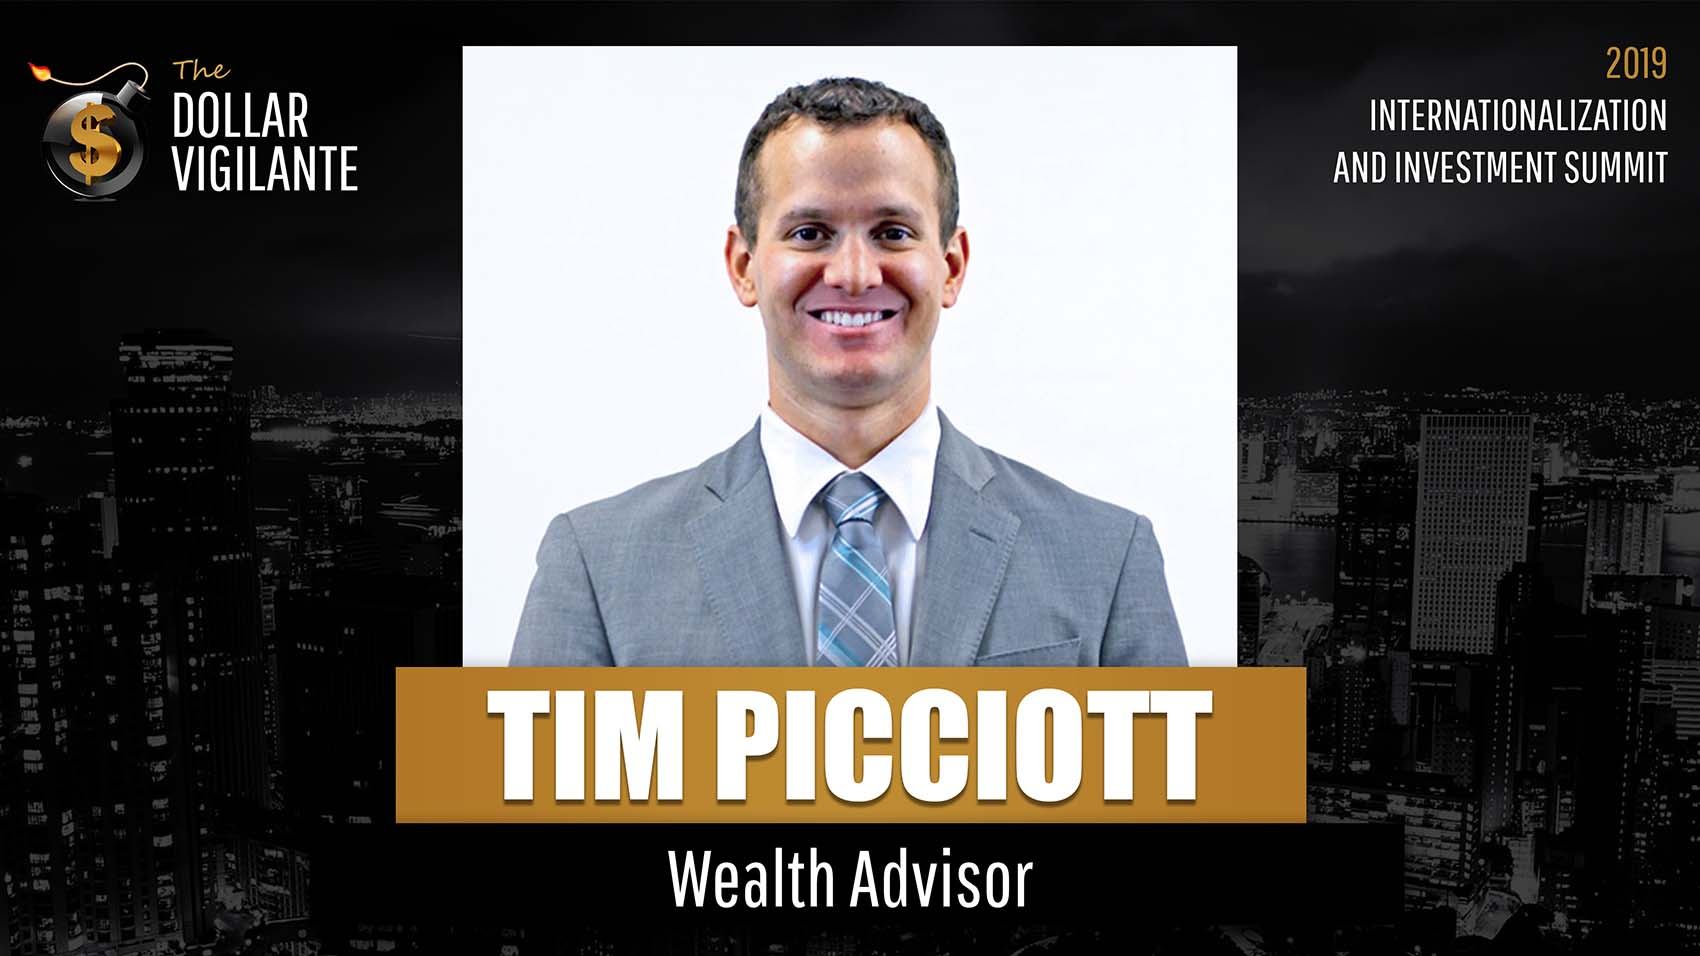 Tim picciott 1700